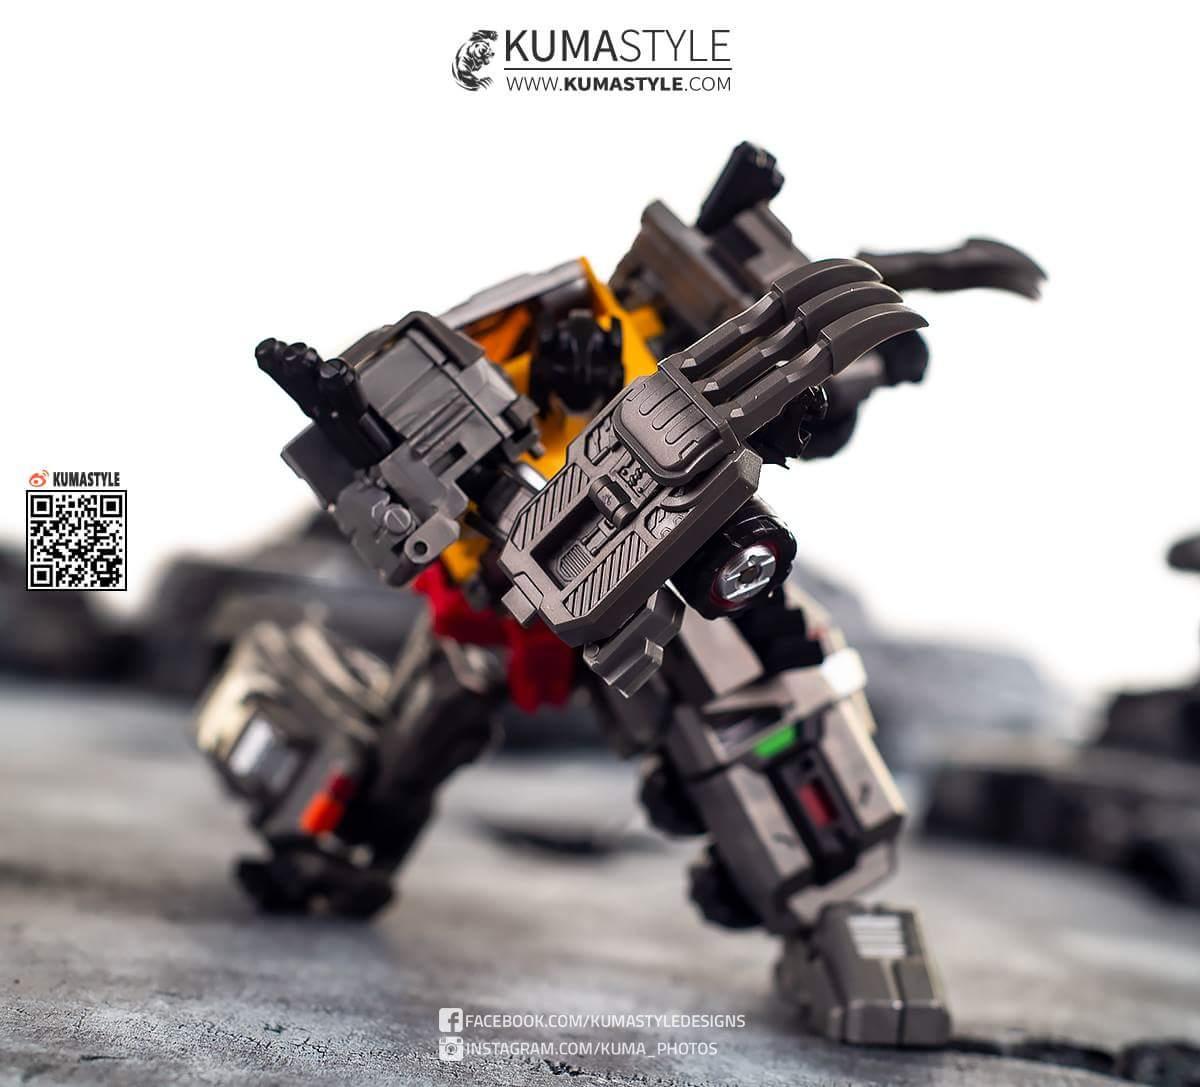 [FansProject] Produit Tiers - Jouets LER (Lost Exo Realm) - aka Dinobots - Page 4 ZqAoLJ6J_o